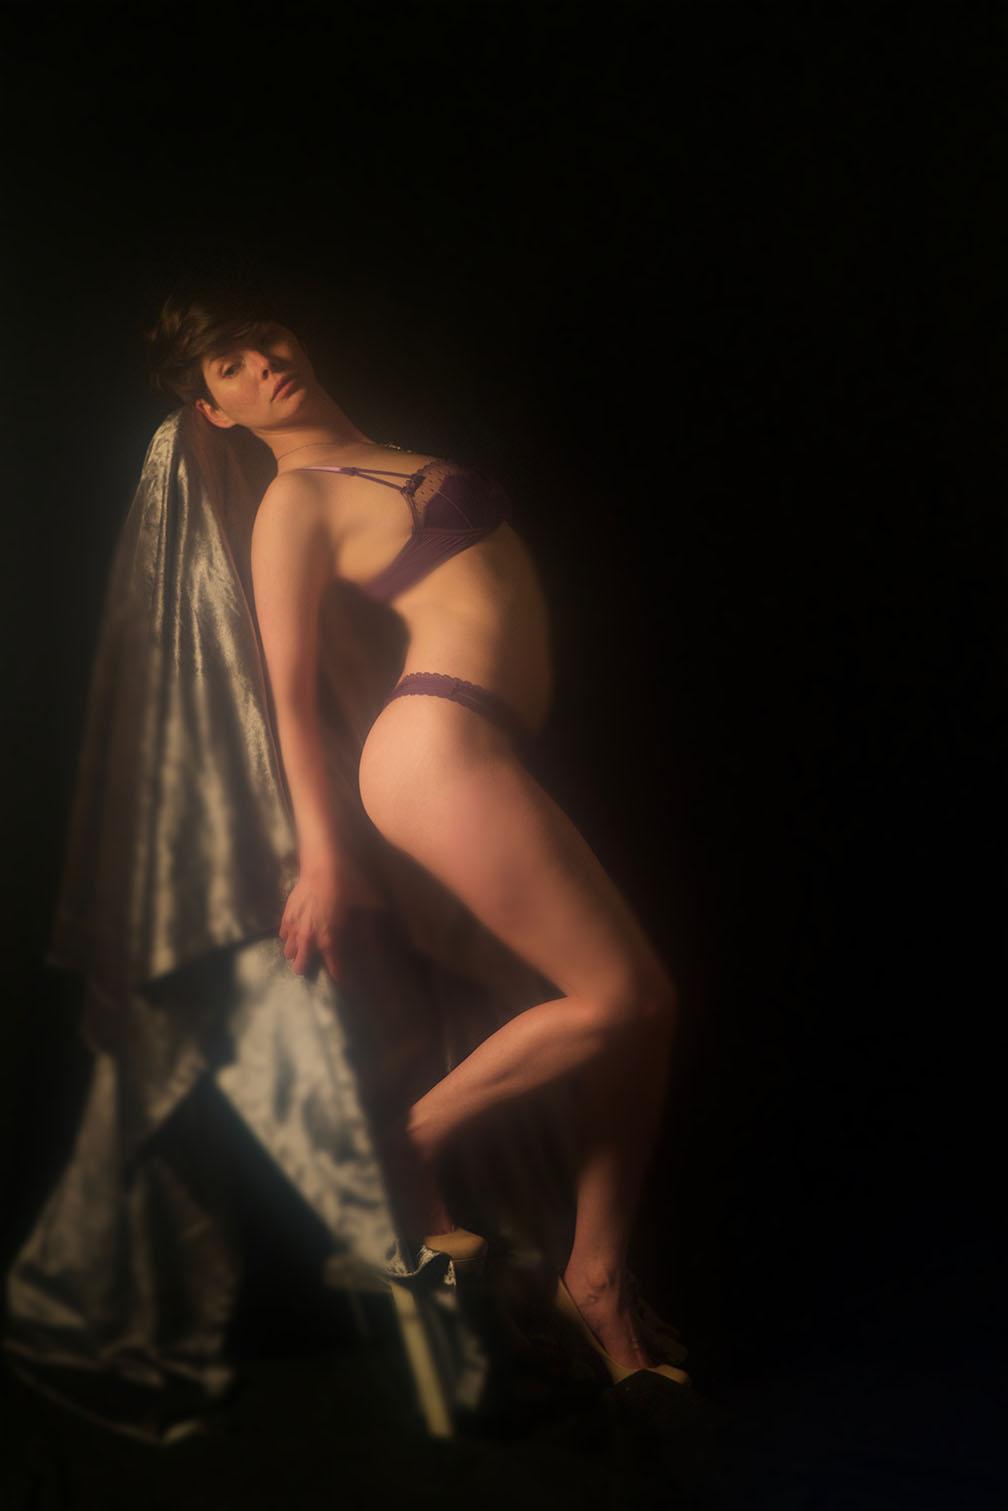 Giselle Marie. 4